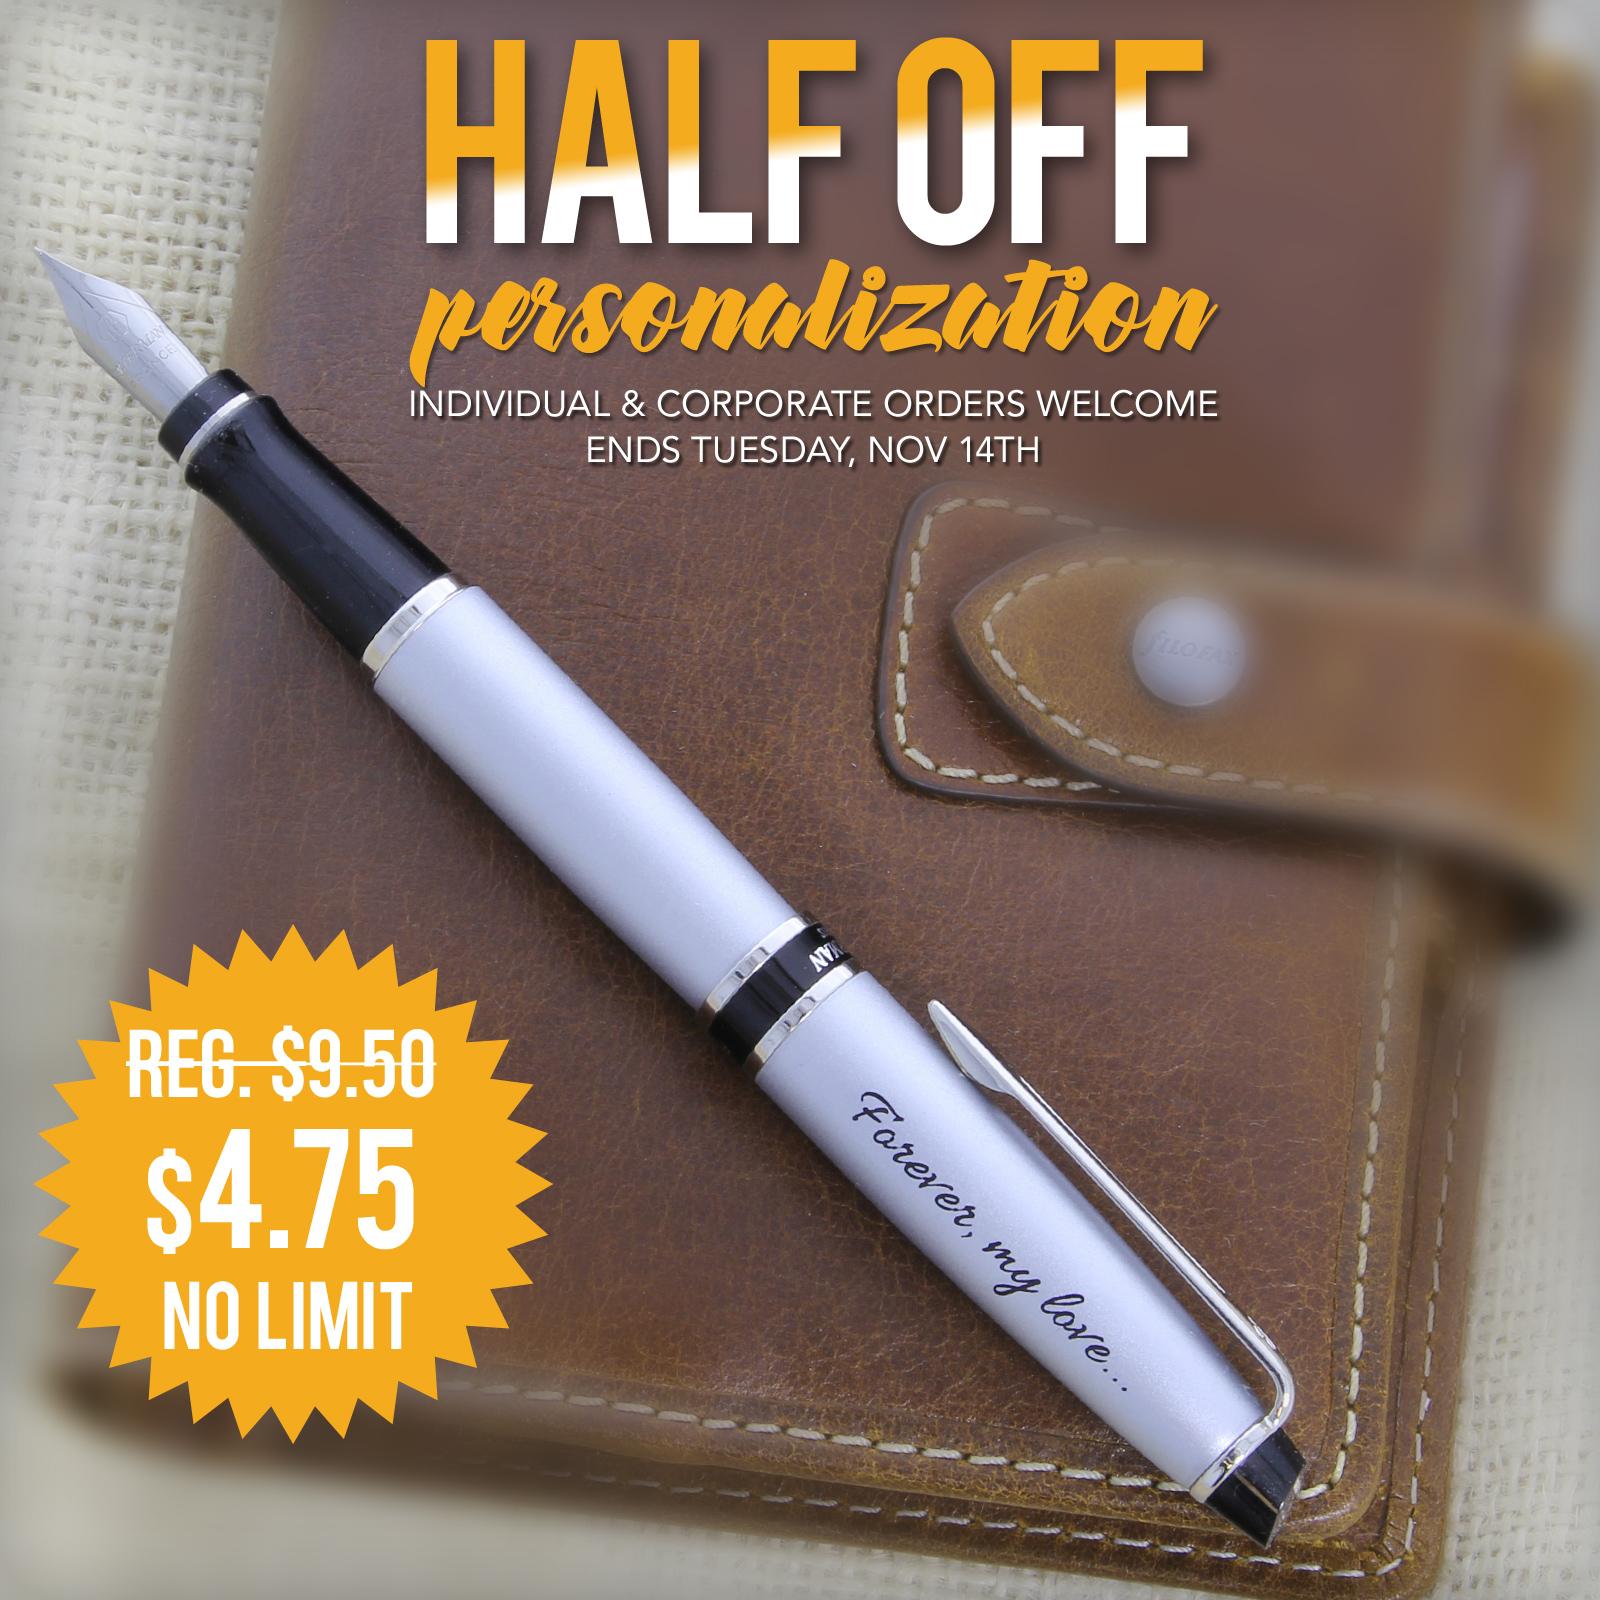 Goldspot-Engraving-Promotion